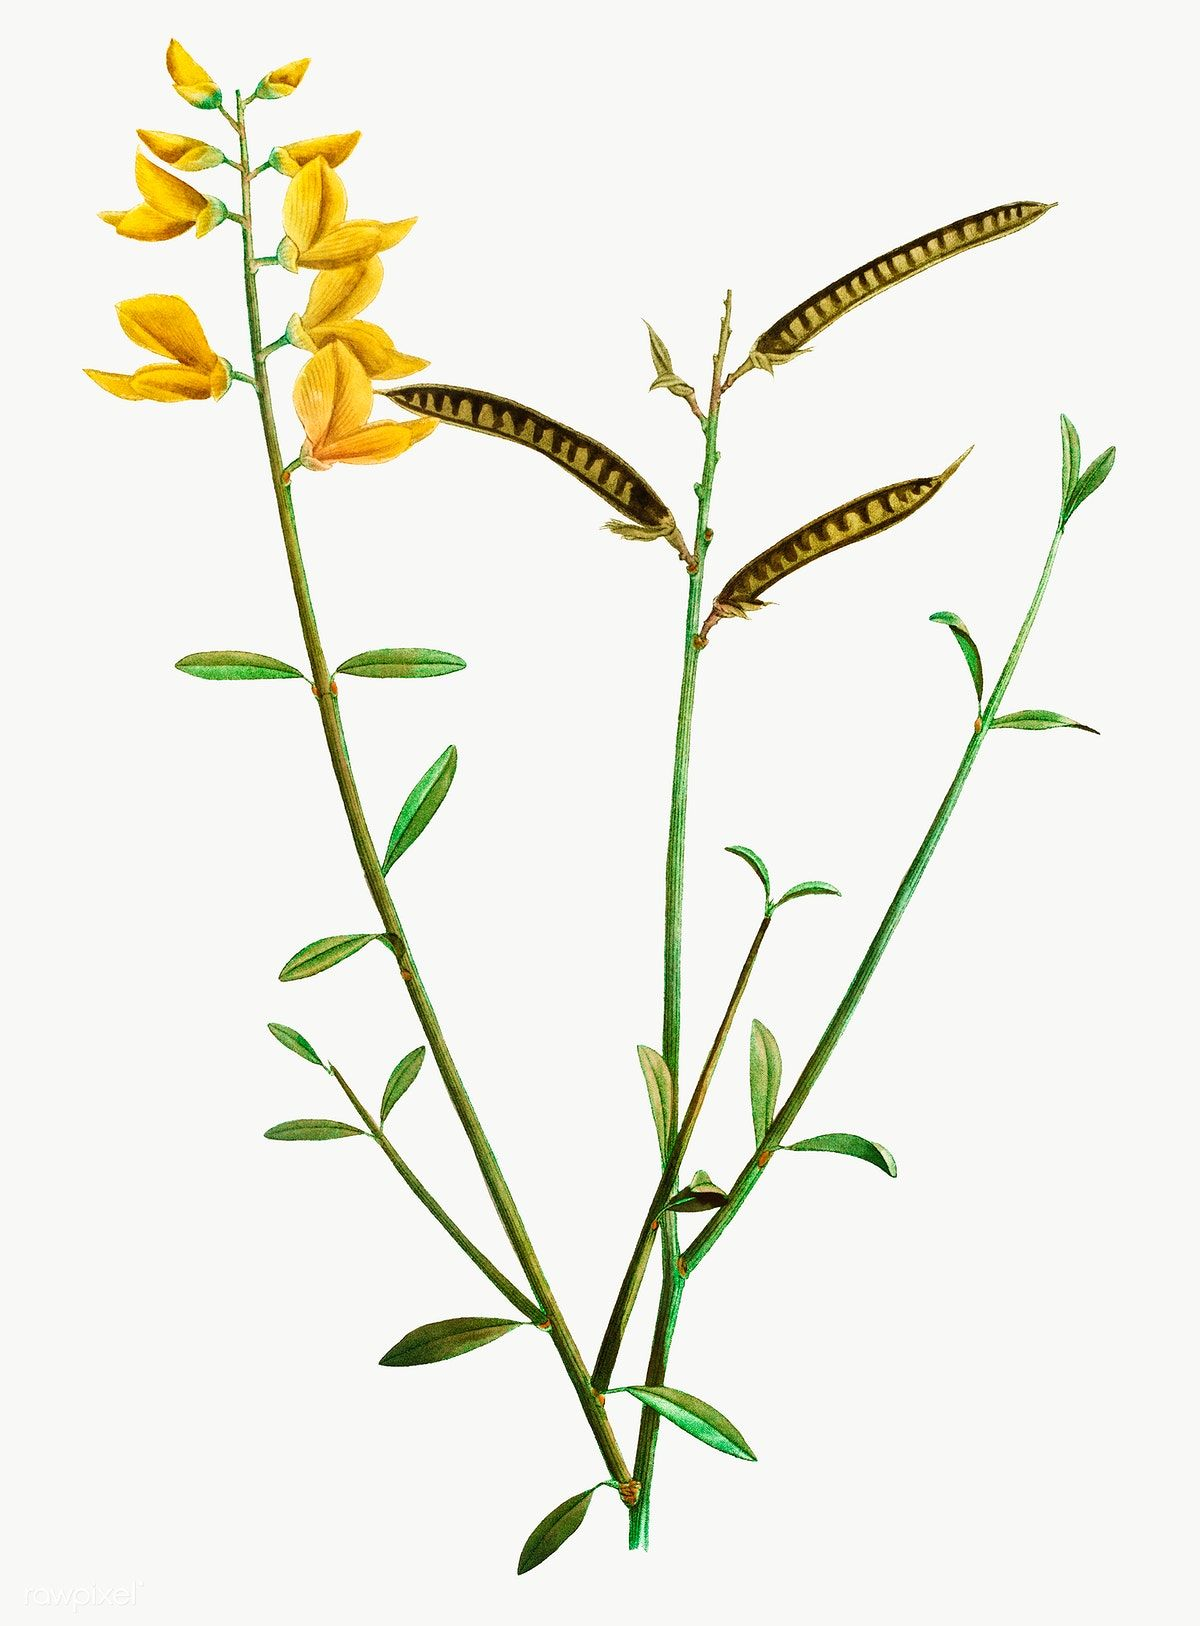 Spanish Broom Flower Transparent Png Free Image By Rawpixel Com Spanish Broom Vintage Illustration Flowers